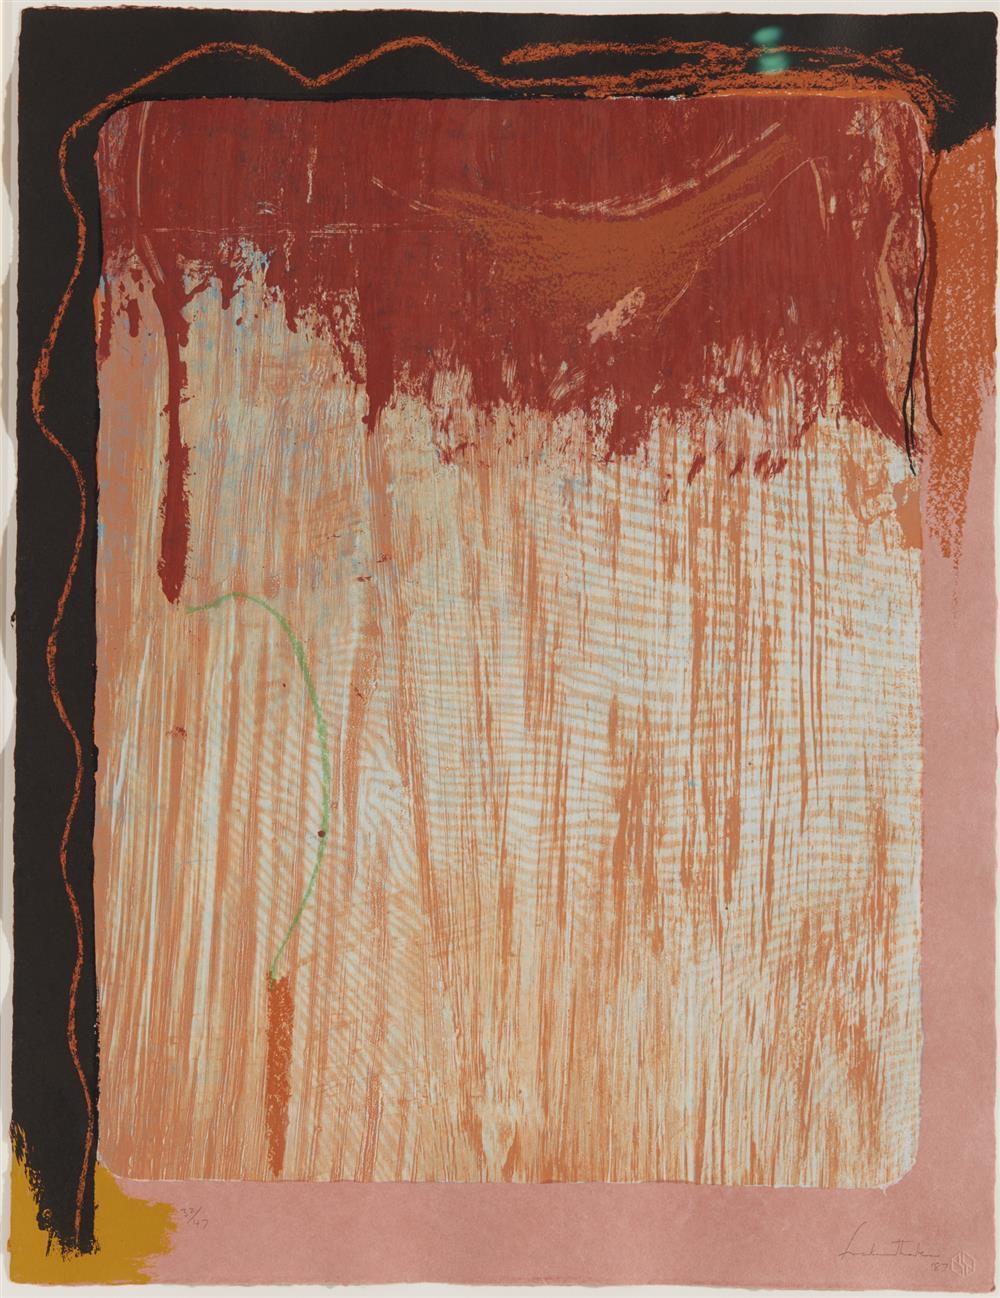 HELEN FRANKENTHALER, (American, 1928-2011), Tribal Sign, 1987, lithograph, sheet: 24 x 18 1/2 in., frame: 36 x 30 in.